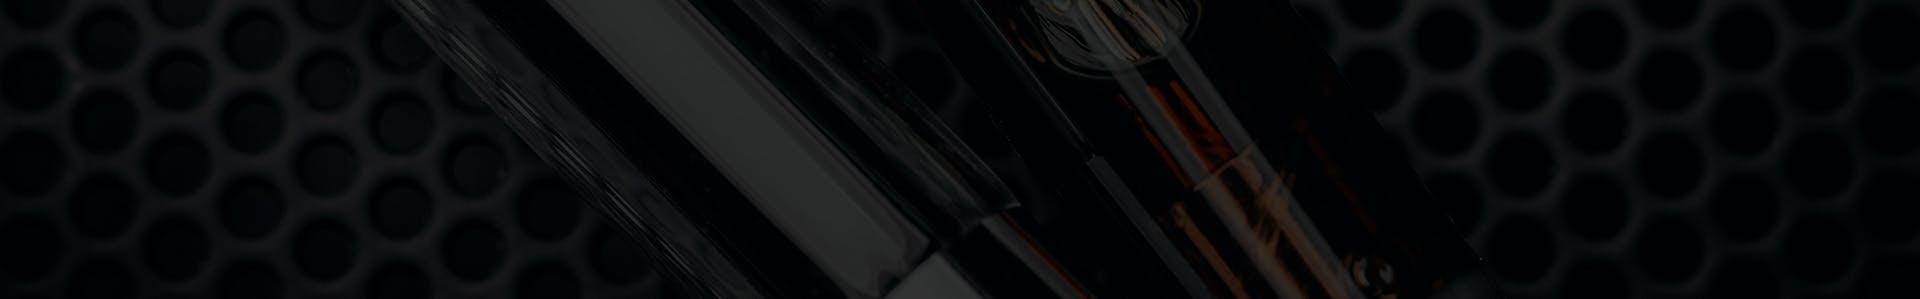 Best Pre-Filled THC Oil Cartridges 2019 [Aug]